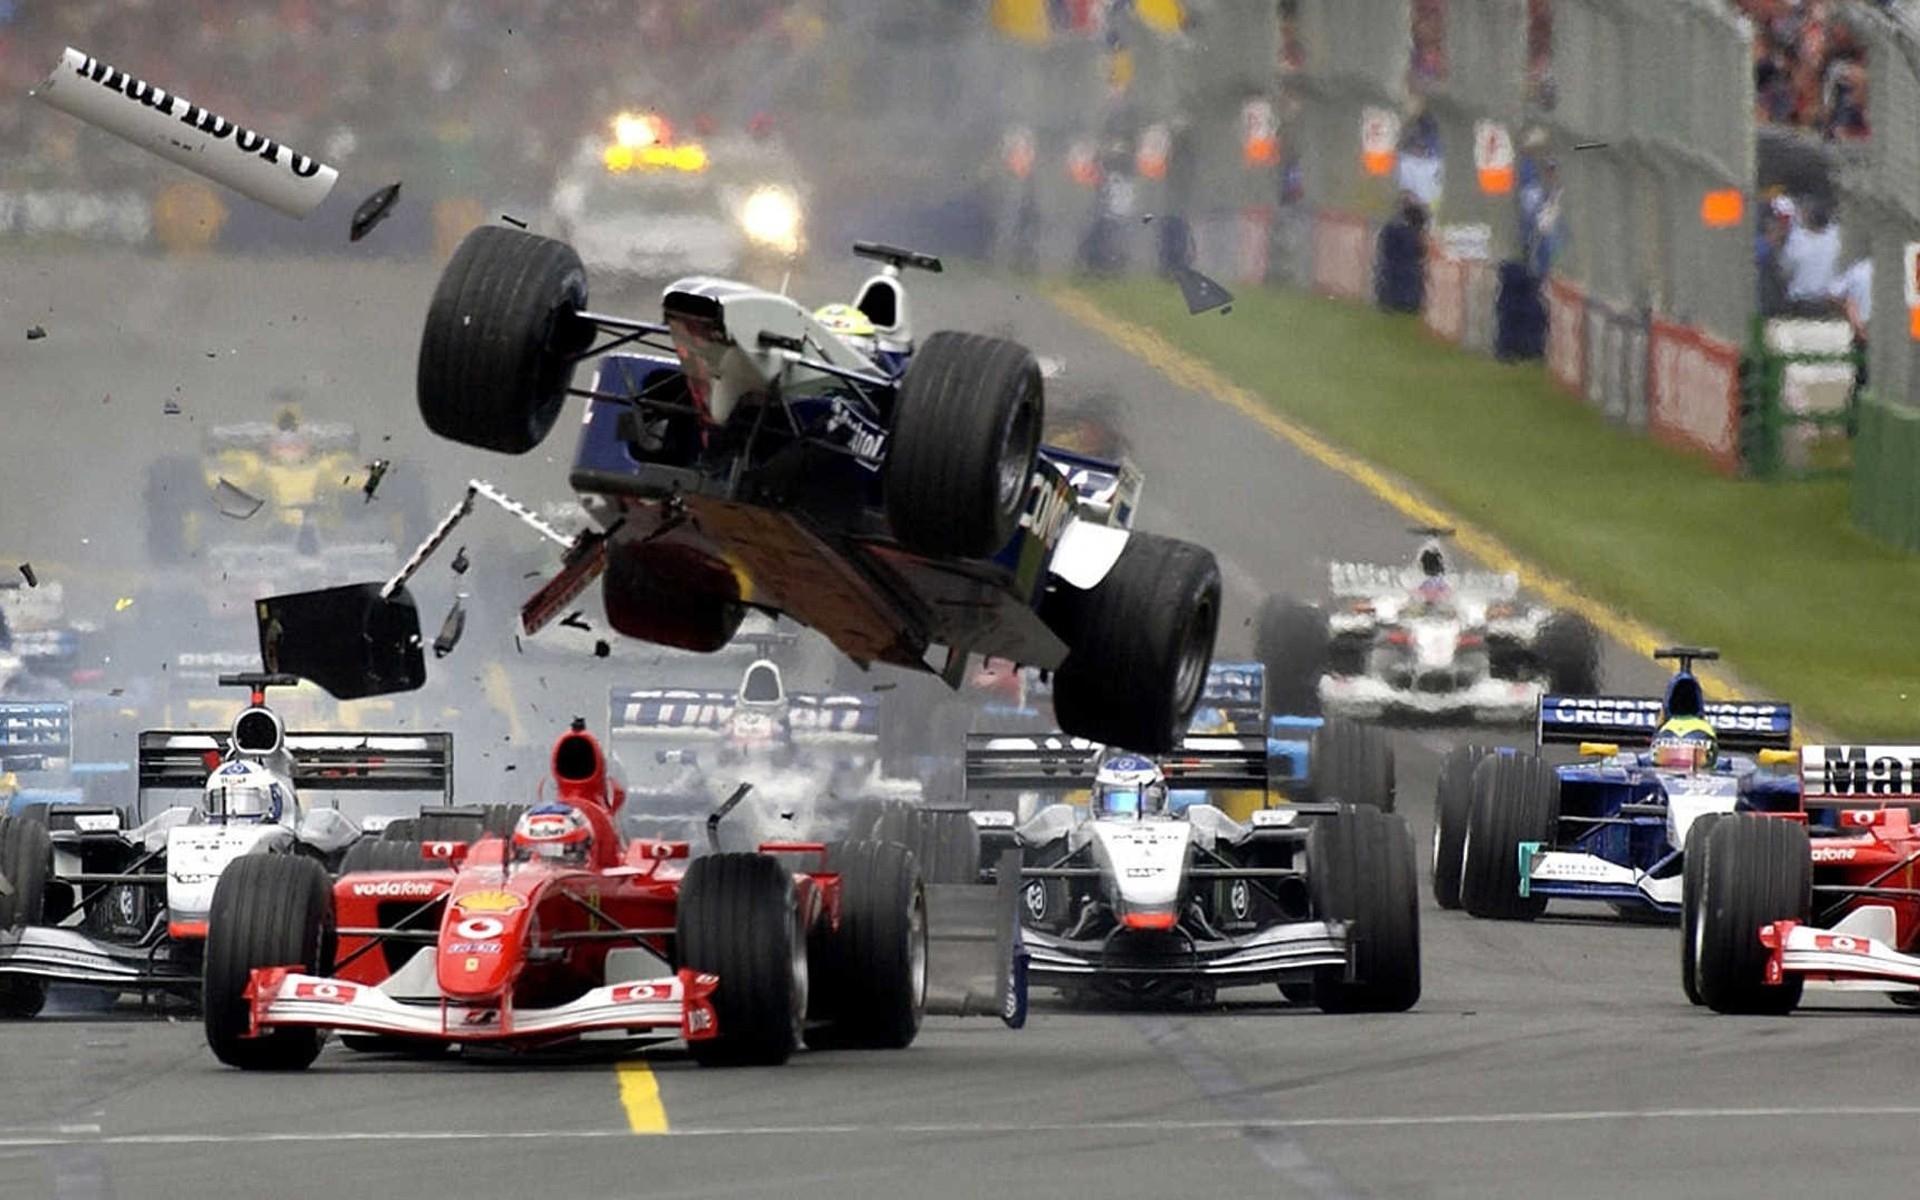 Formula Crash 2013 Cars Ferrari Crash Formula One